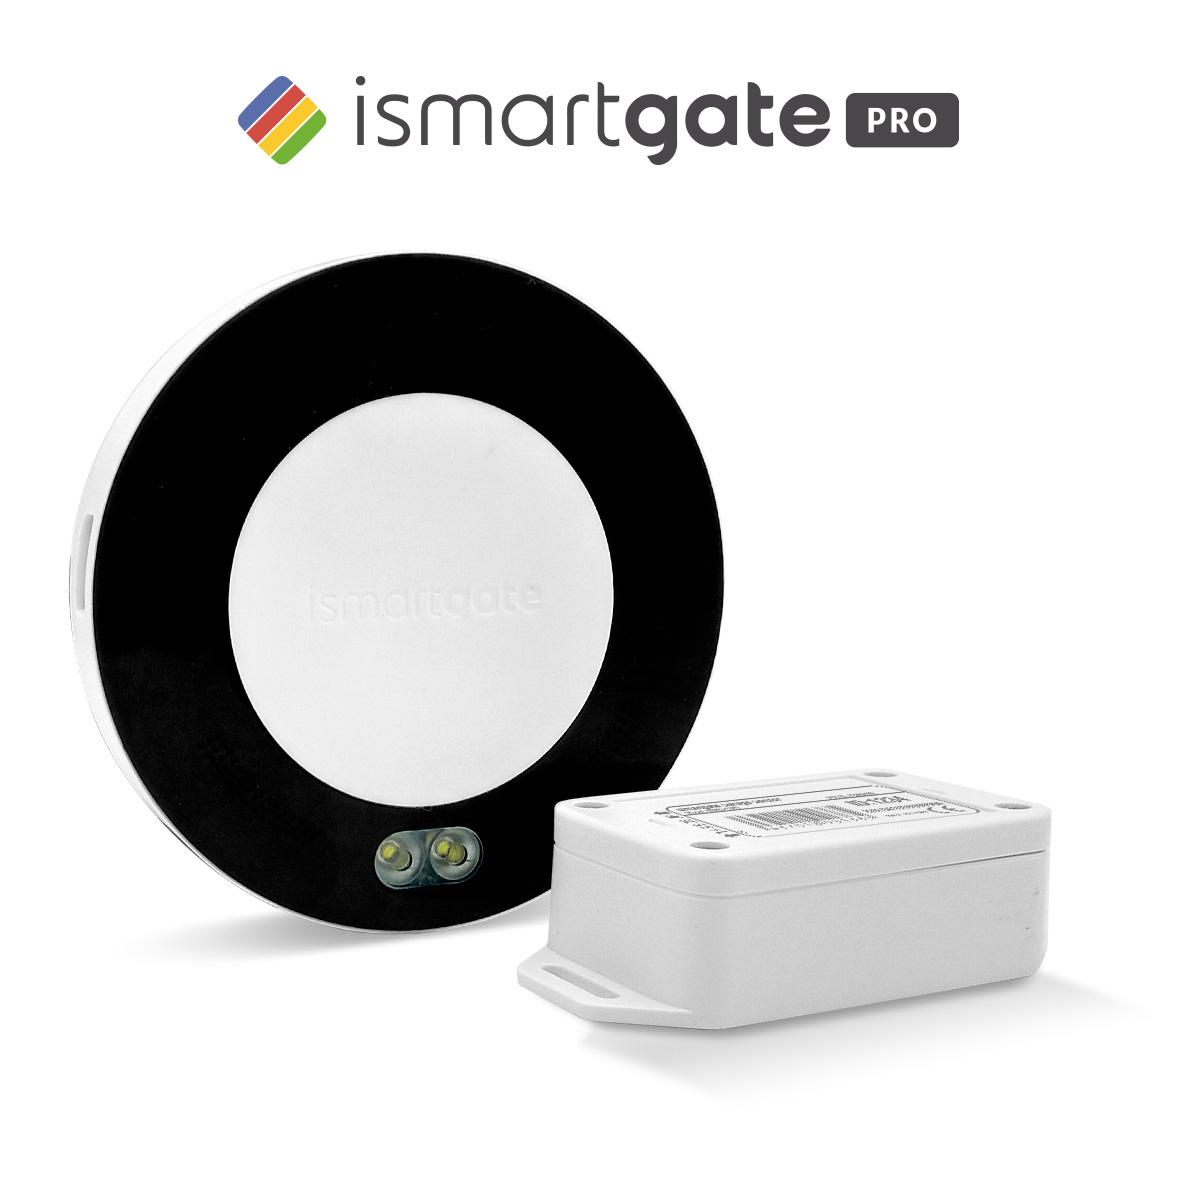 ismartgate PRO Garagentor-Set